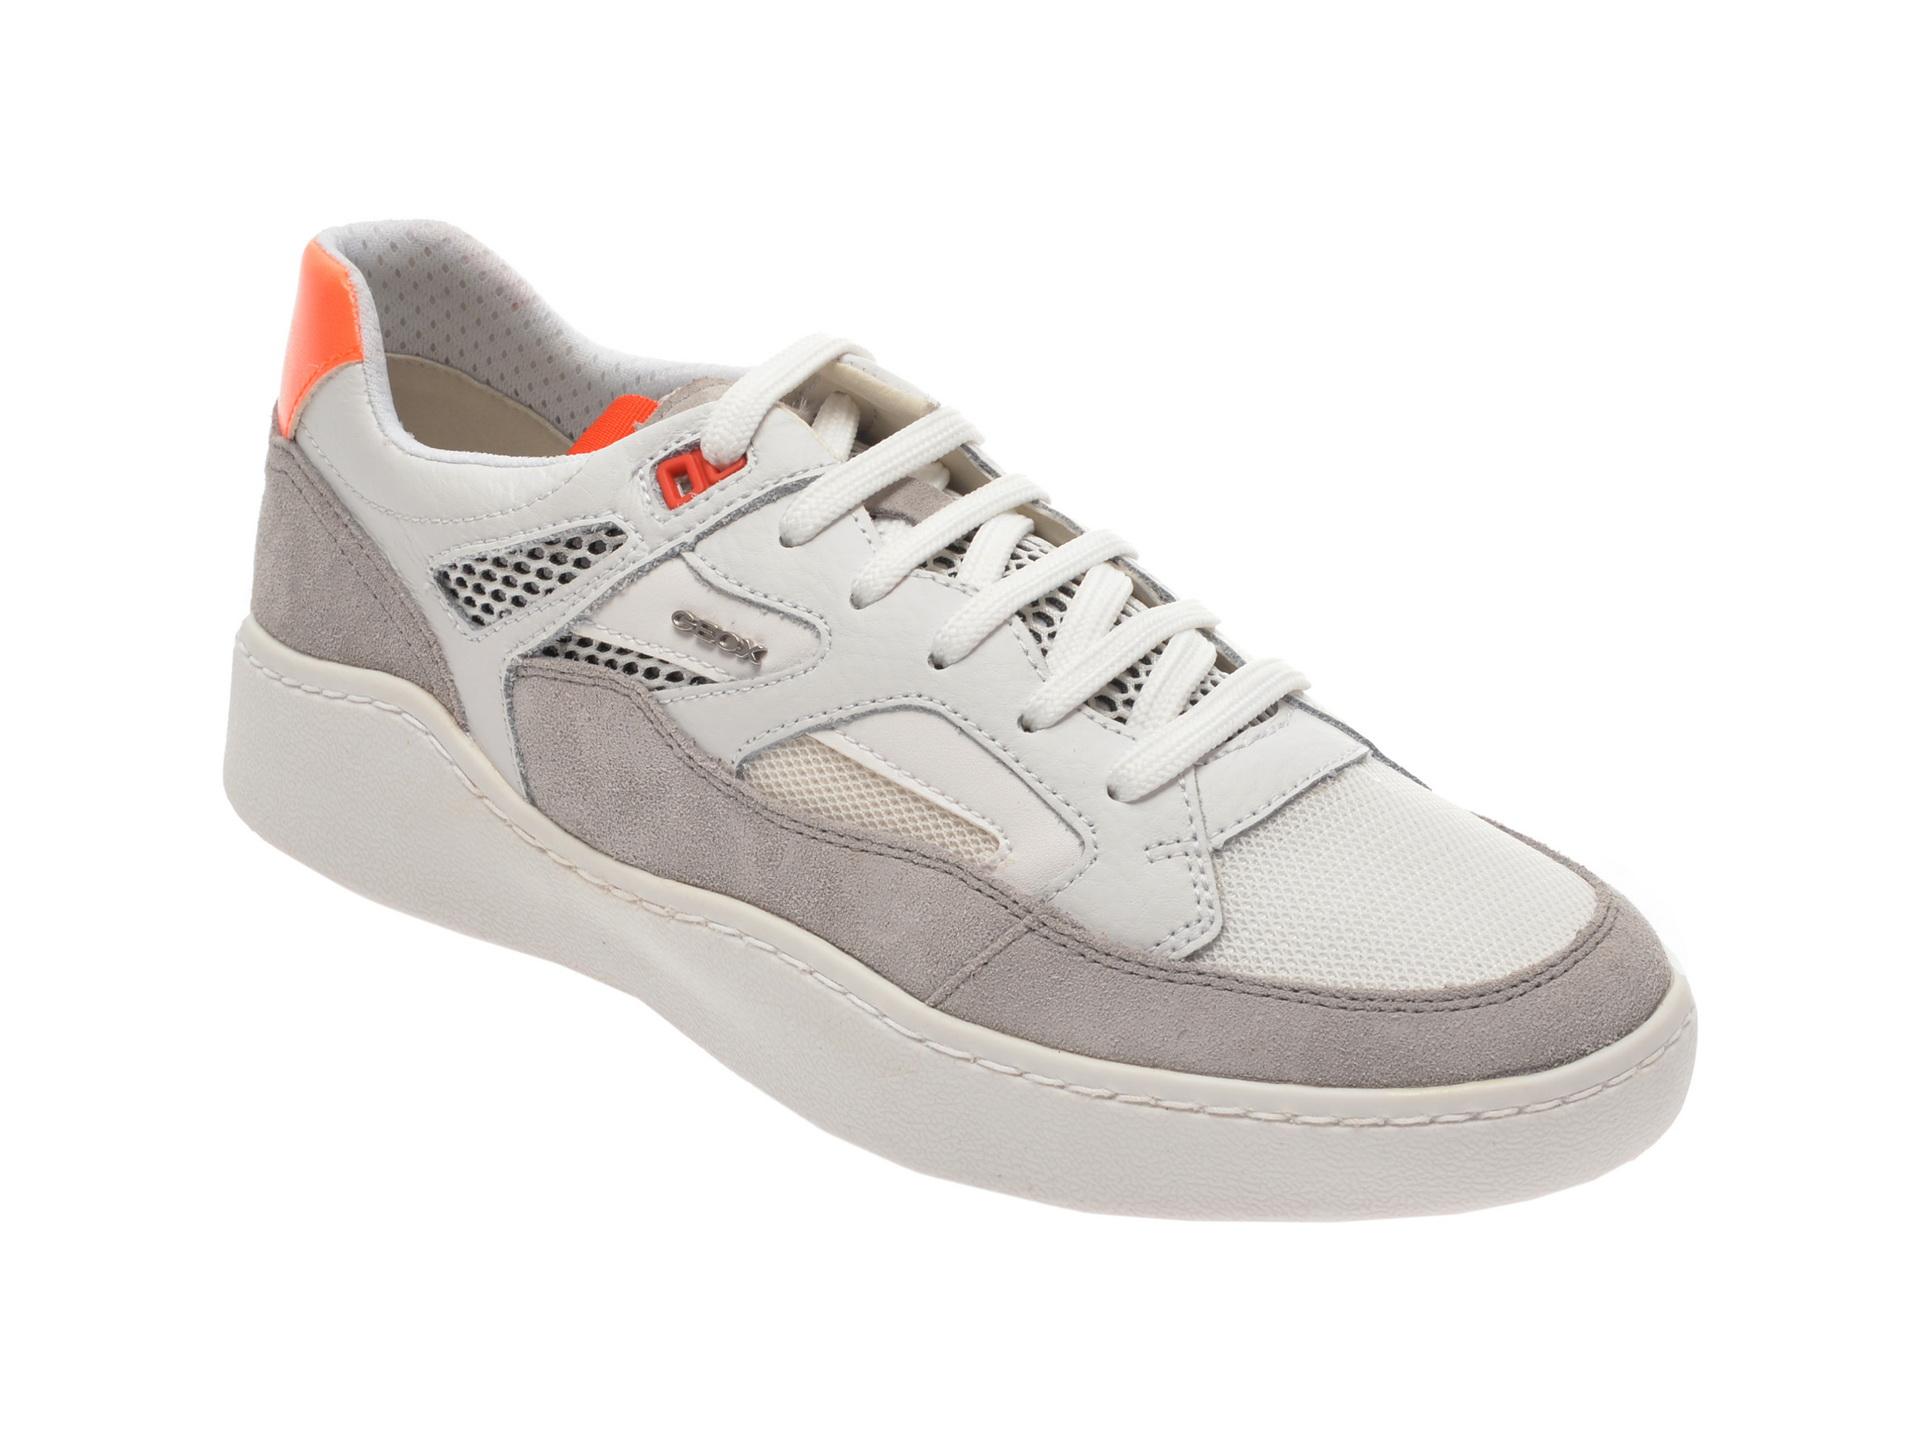 Pantofi sport GEOX albii, U027XA, din material textil si piele naturala imagine